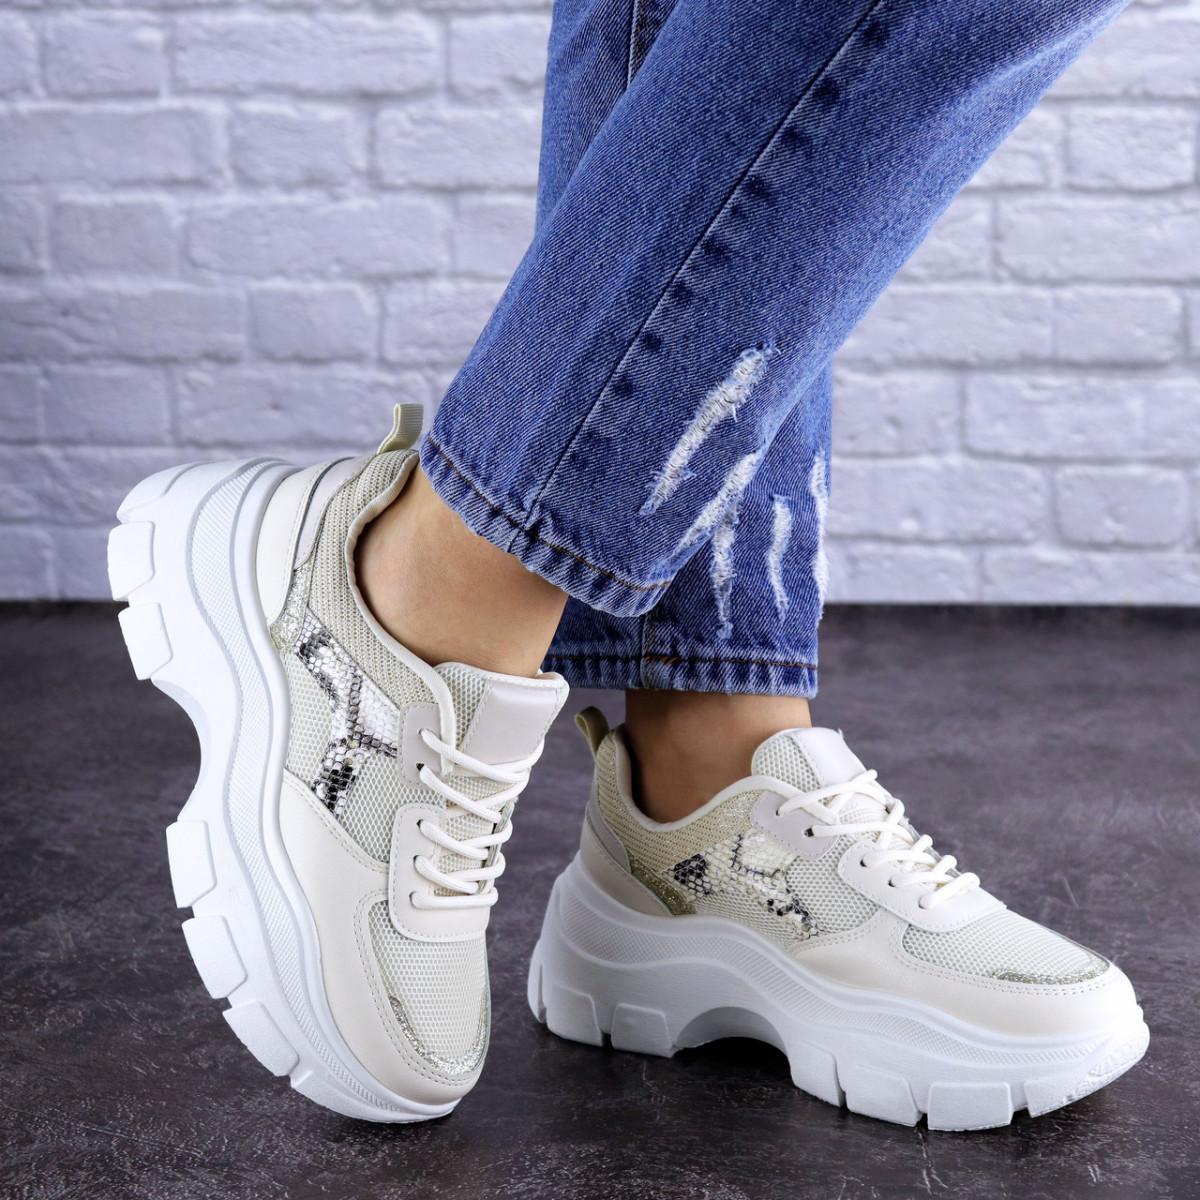 Женские кроссовки Fashion Braxton 1742 39 размер 24 см Бежевый